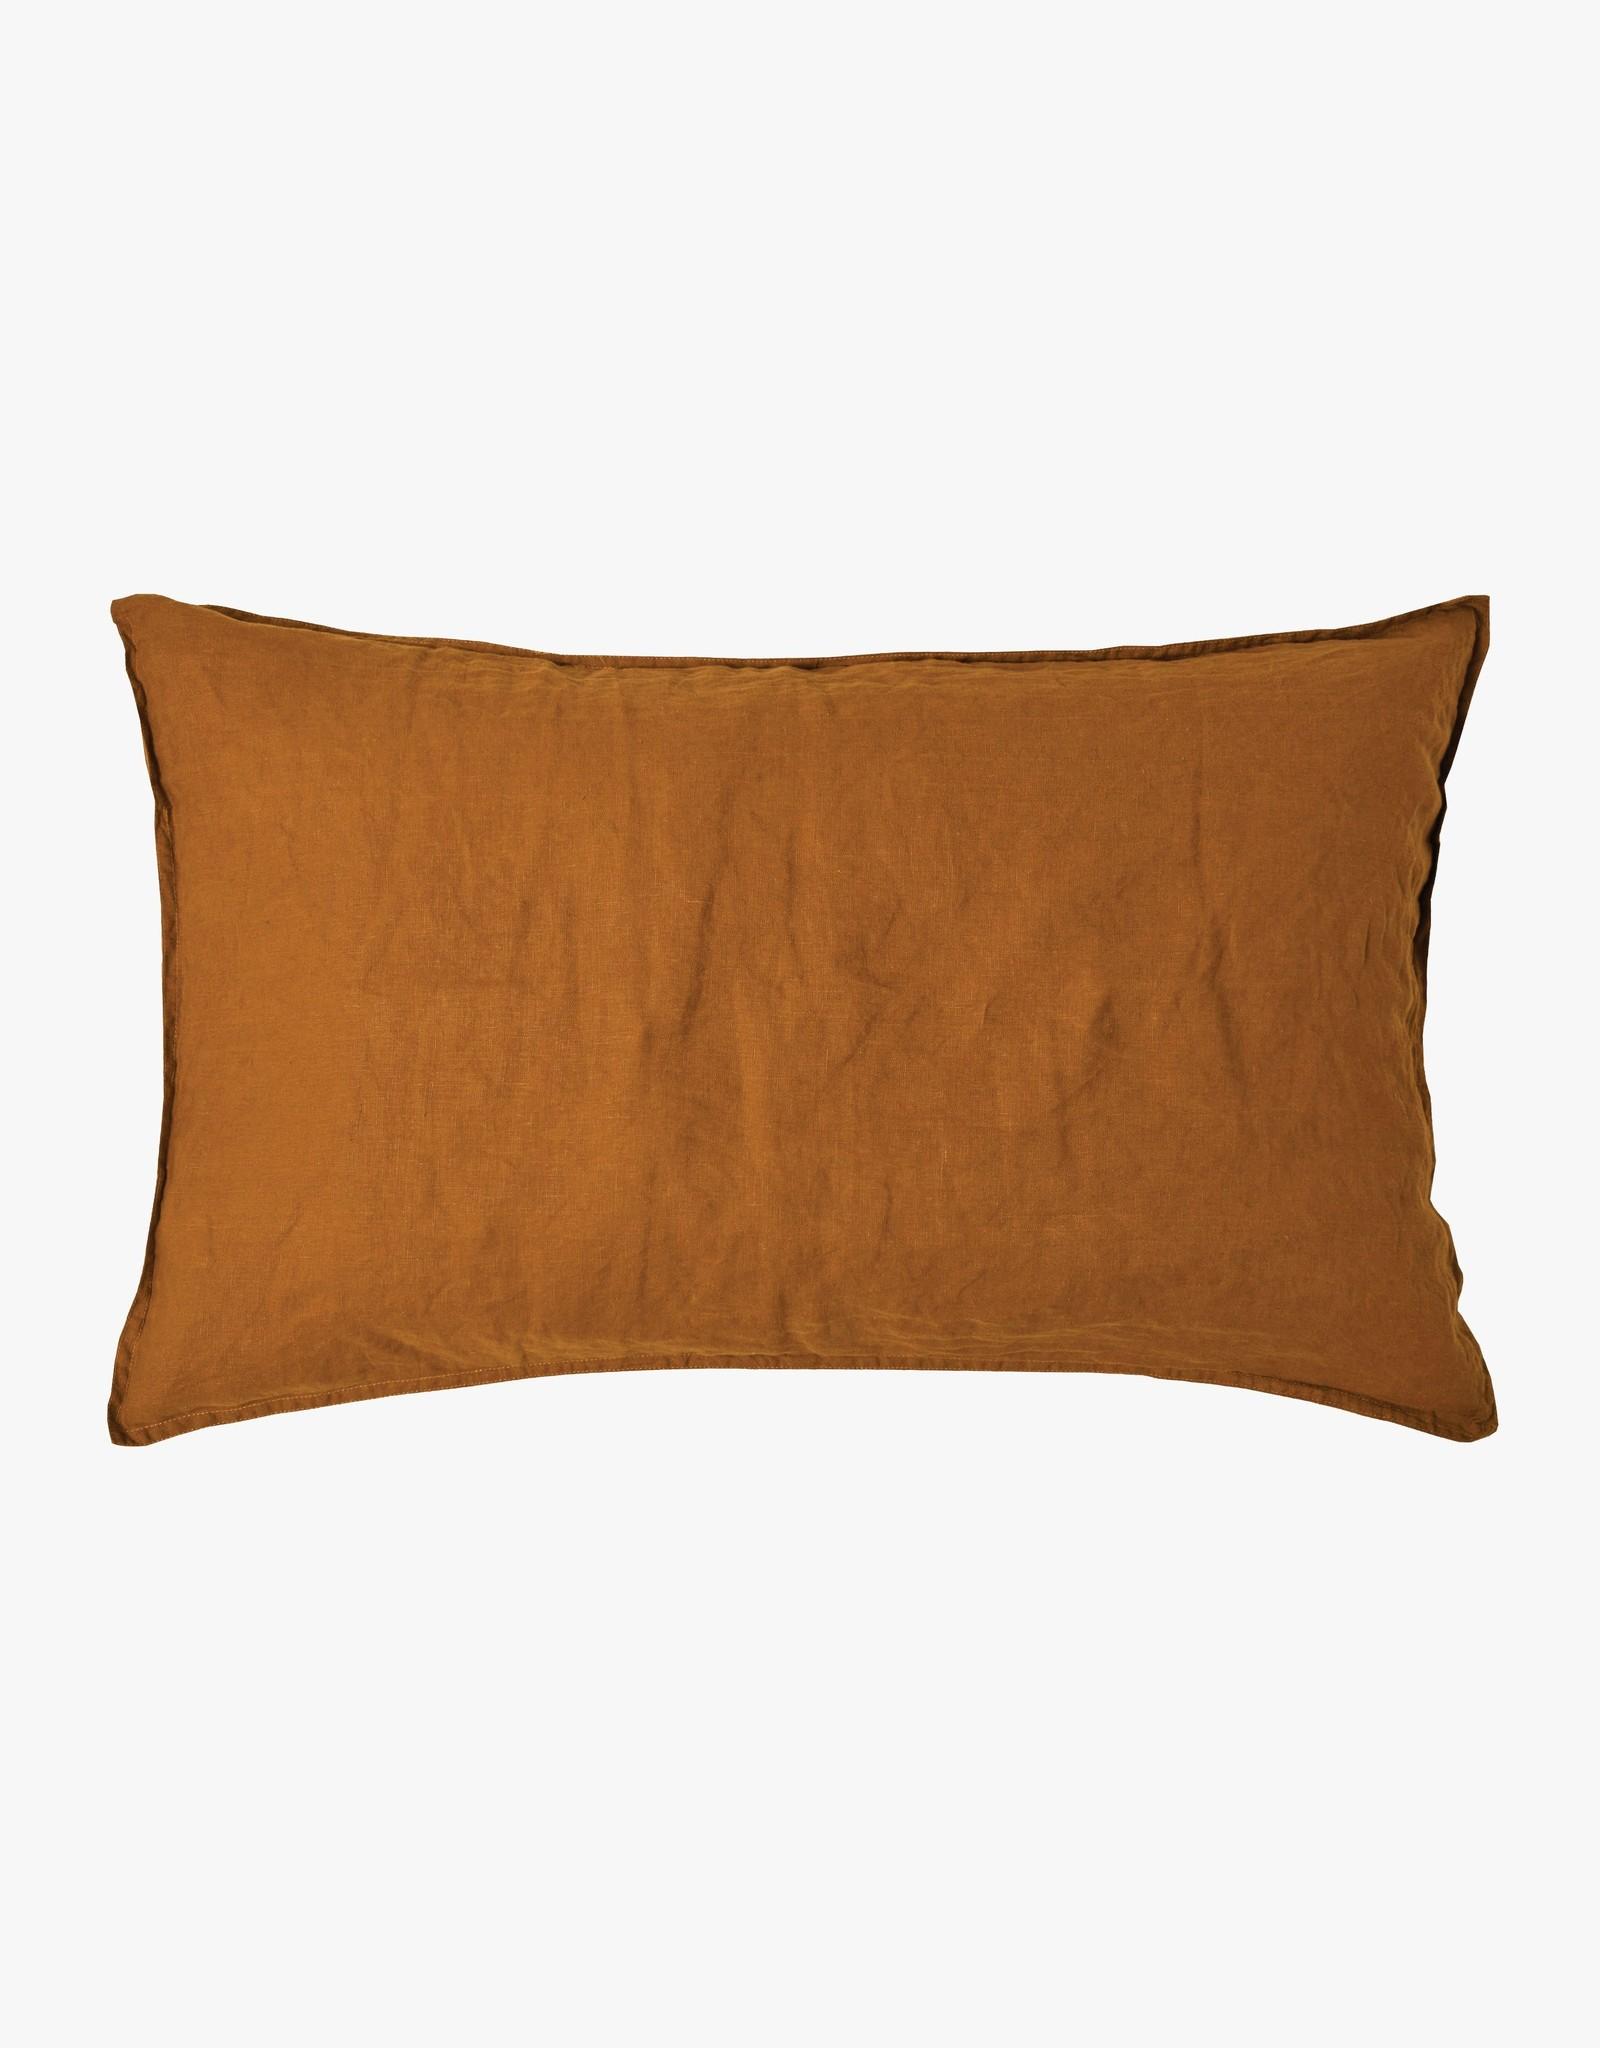 Mondo Tobacco standard pillowcase pair